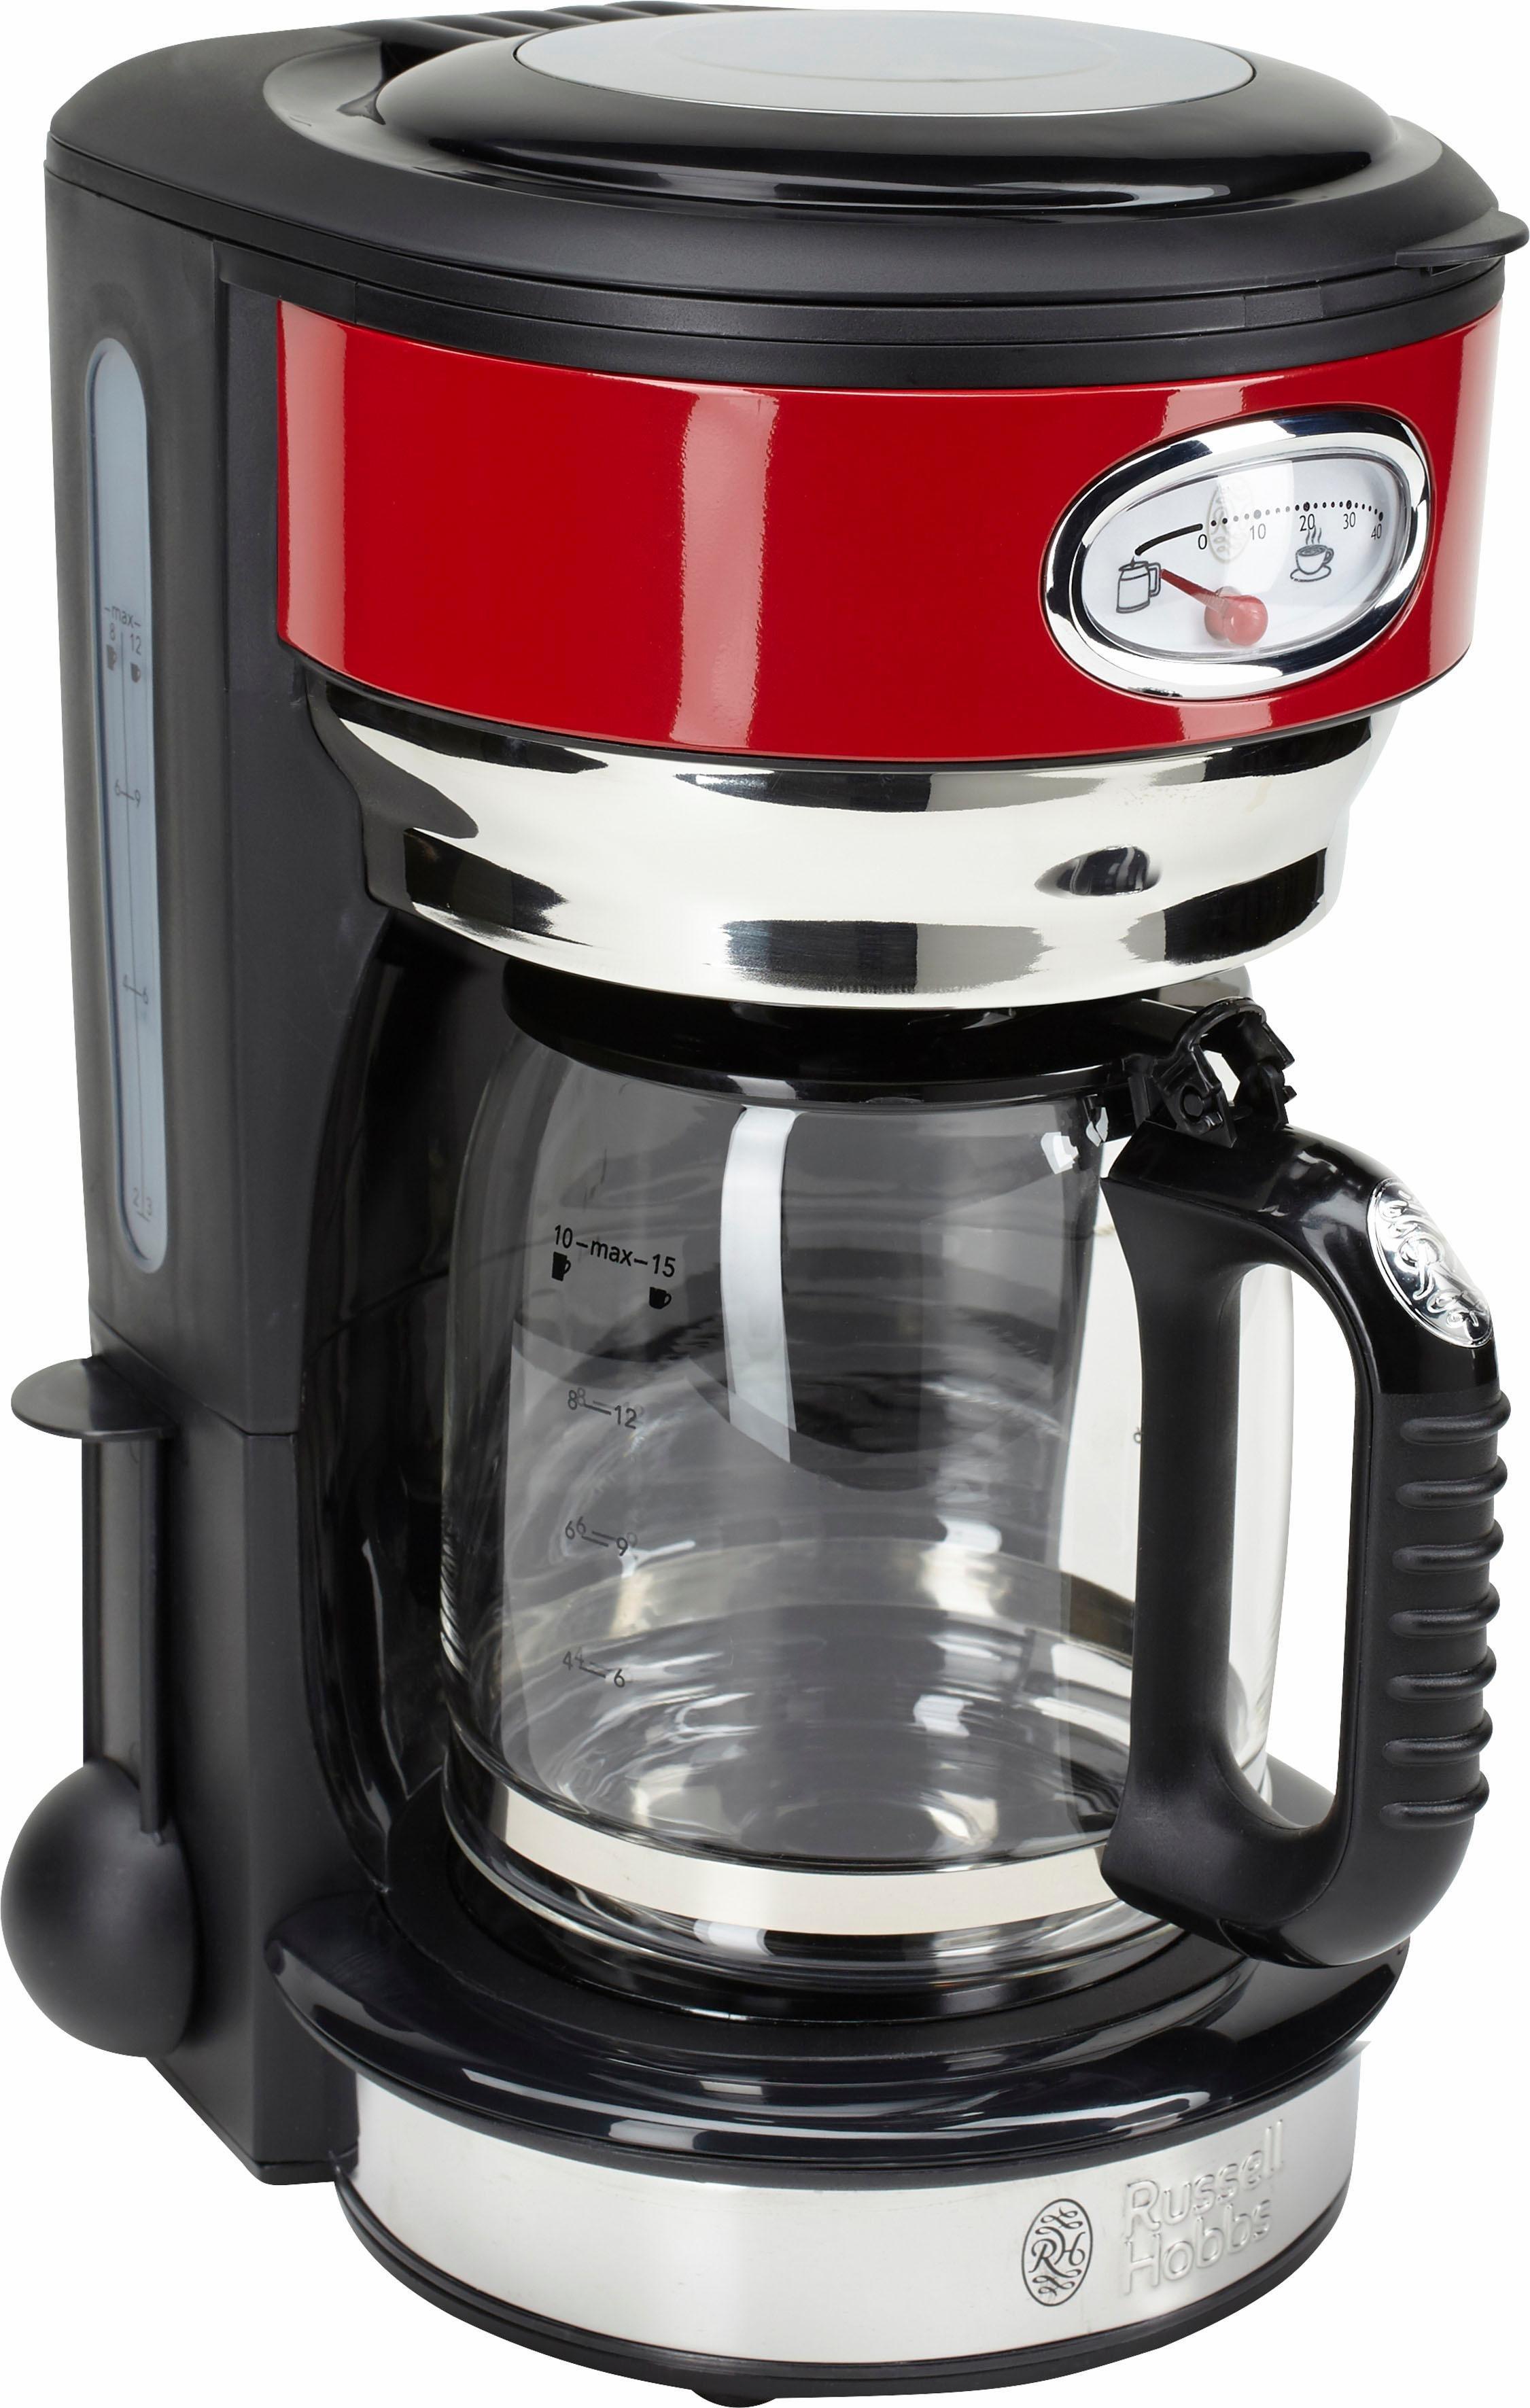 63f356c21759e5 Filterkaffeemaschine Retro Ribbon Red 21700-56, 1,25l Kaffeekanne,  Papierfilter 1x4. RUSSELL HOBBS ...